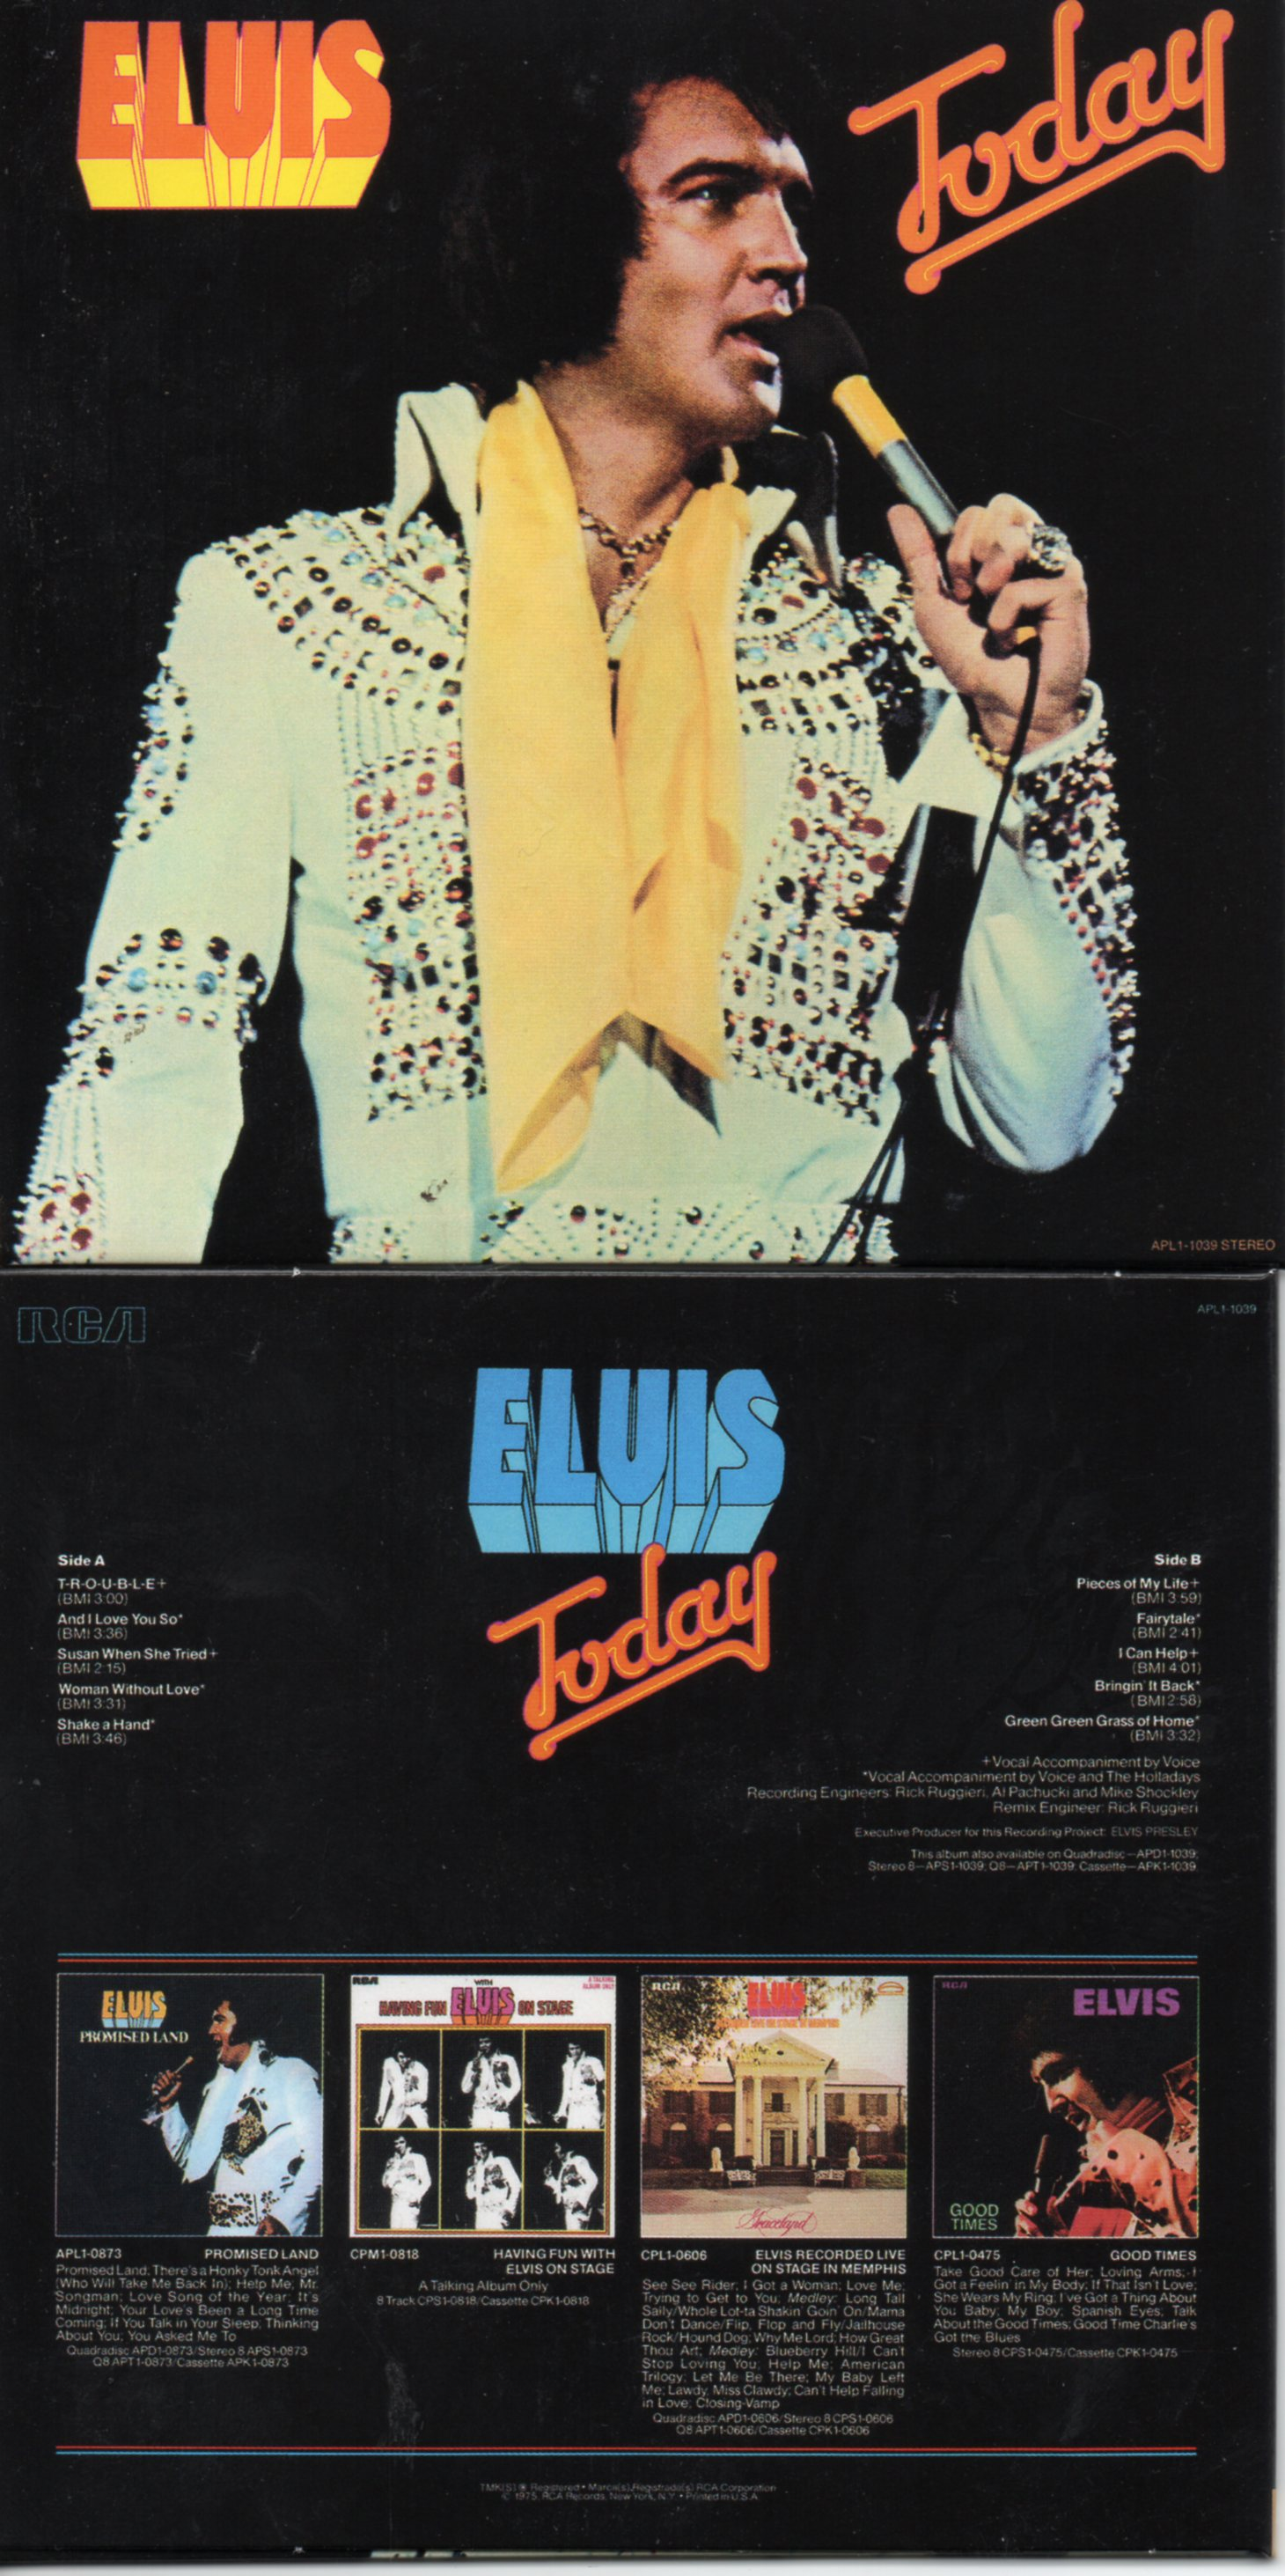 Elvis PRESLEY - Today (1975 - Mini Lp Replica - 10-track Card Sleeve)